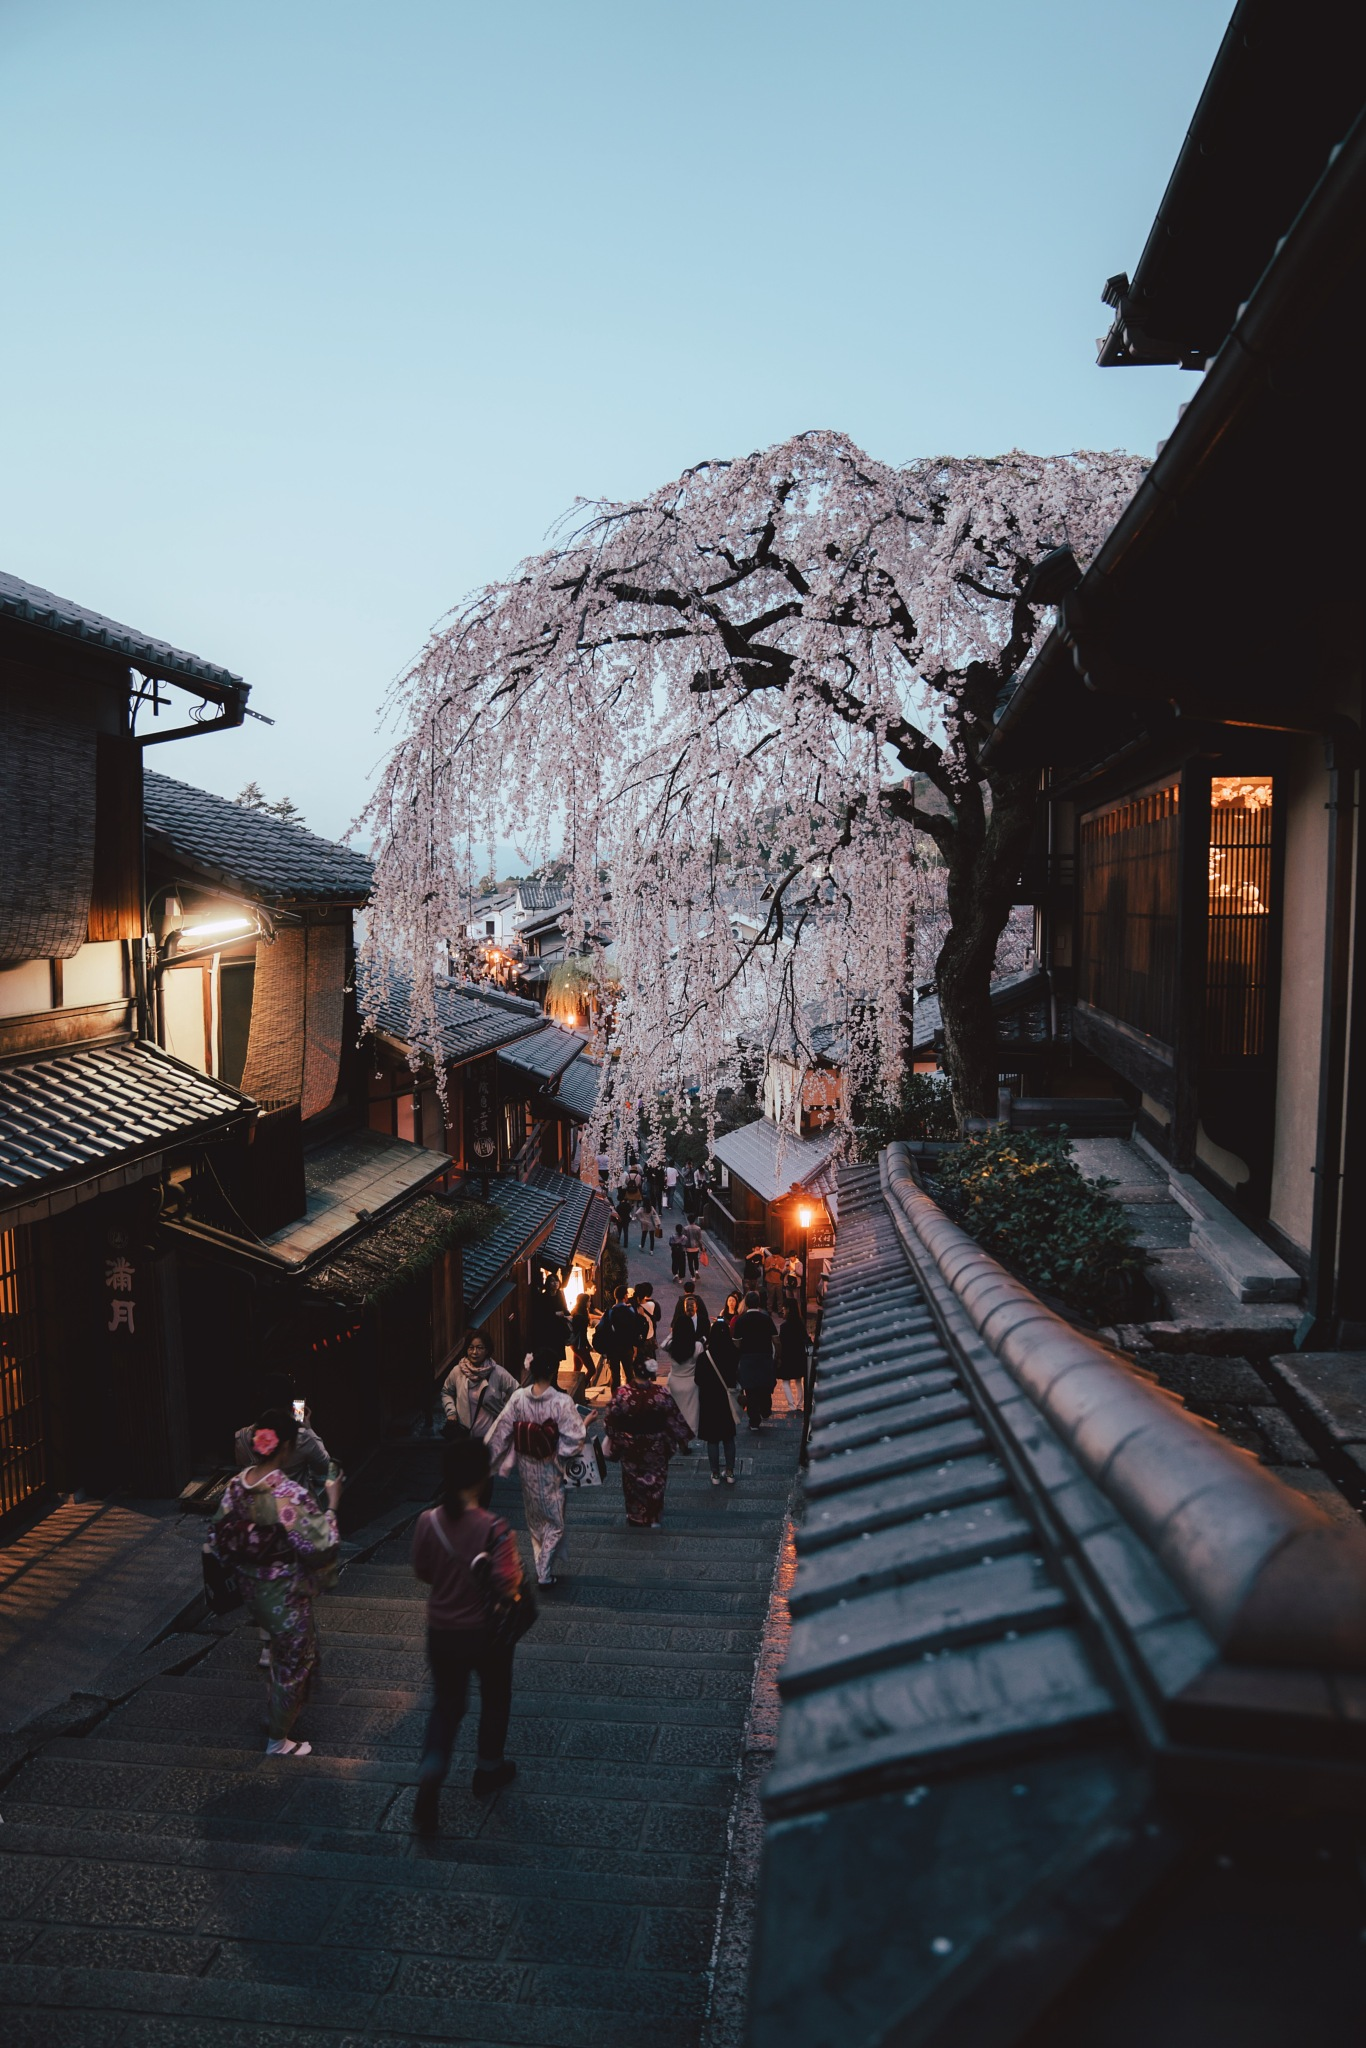 Trip to kyoto by Yasu Ochi